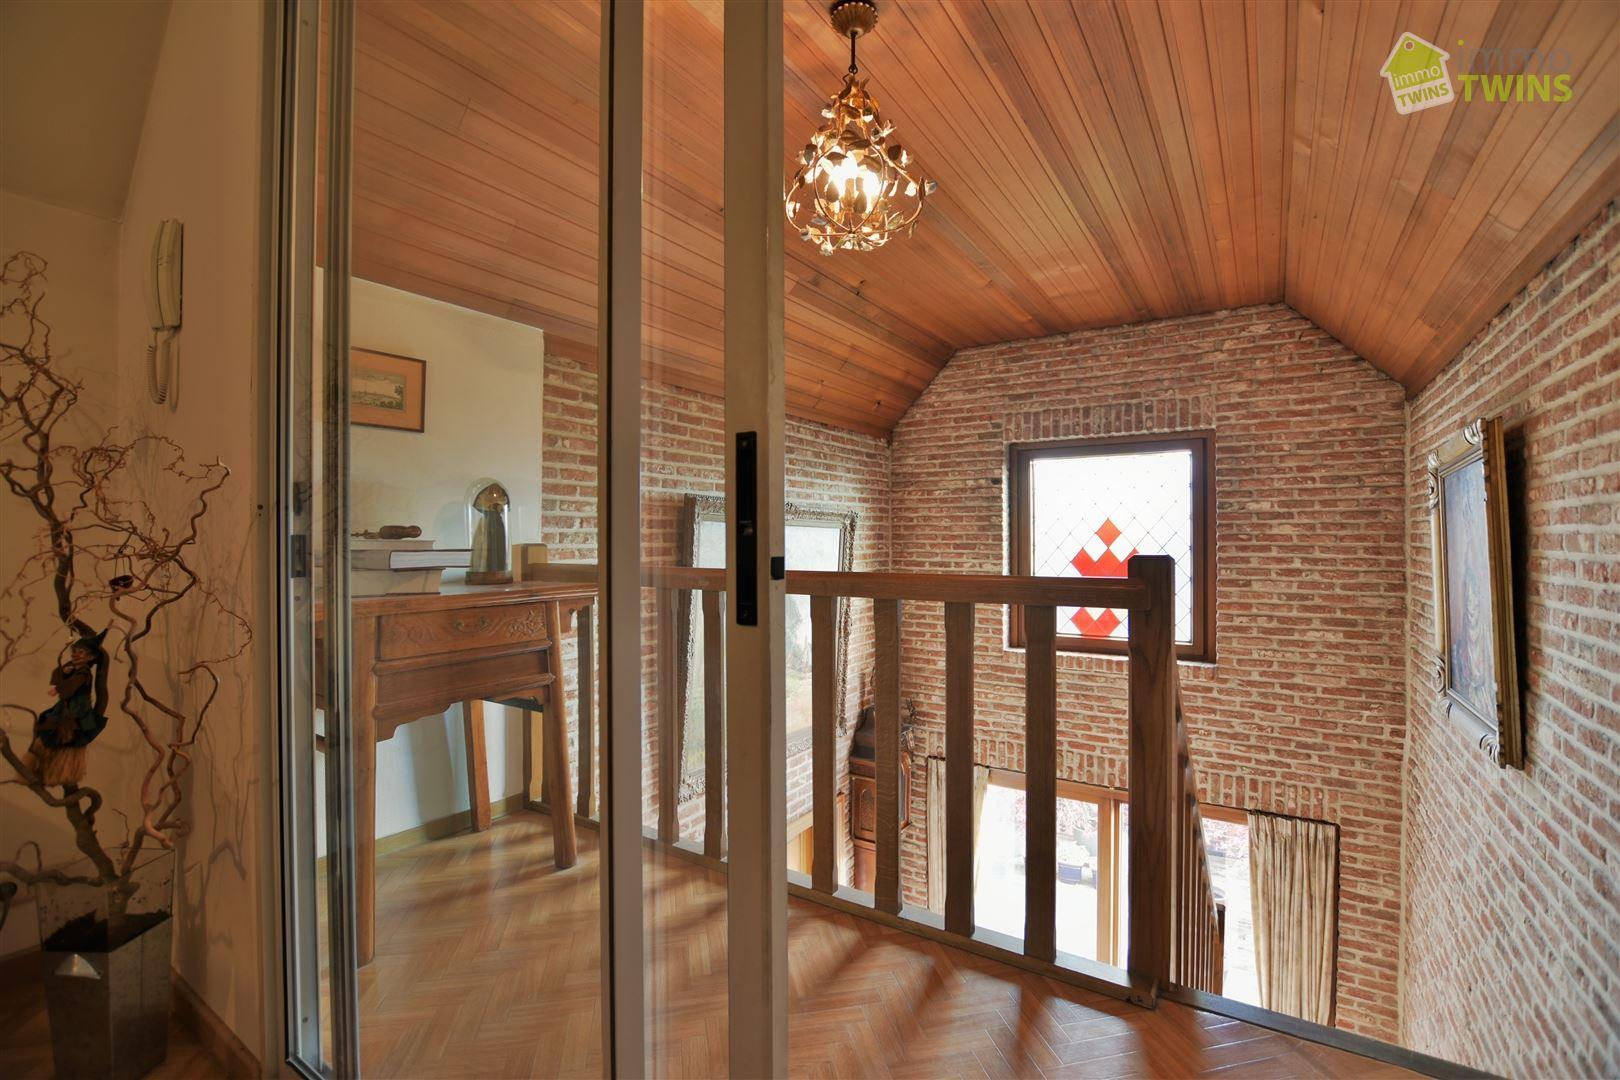 Foto 22 : Duplex/triplex te 9200 Dendermonde (België) - Prijs € 398.000